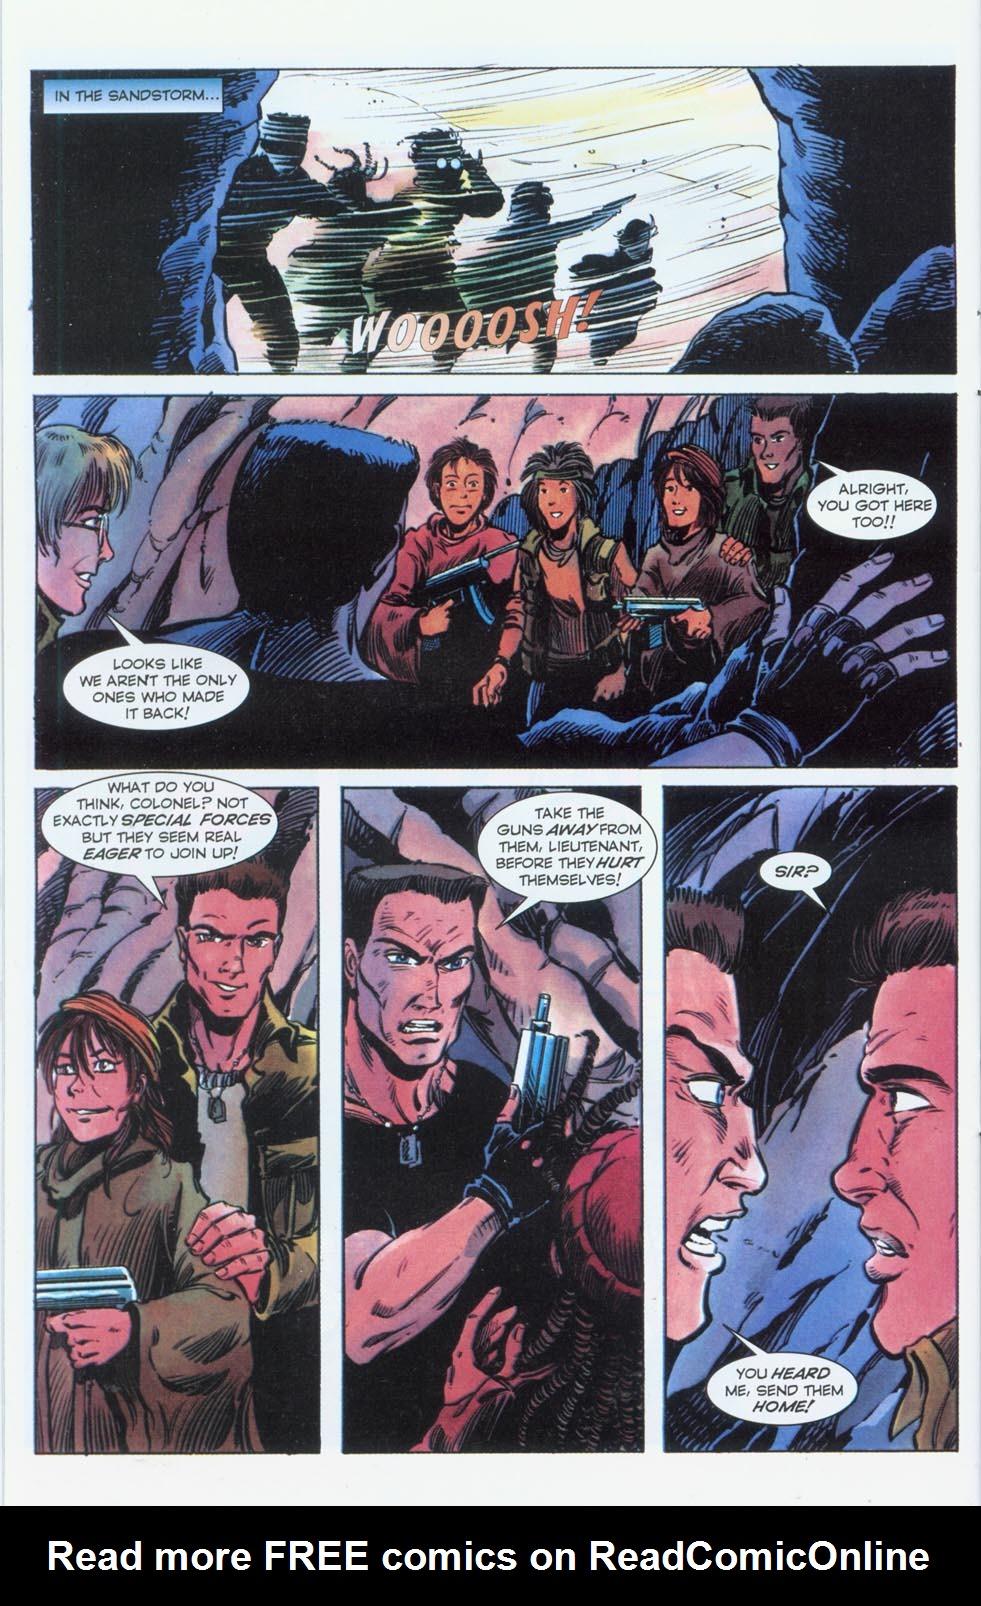 Read online Stargate comic -  Issue #3 - 21